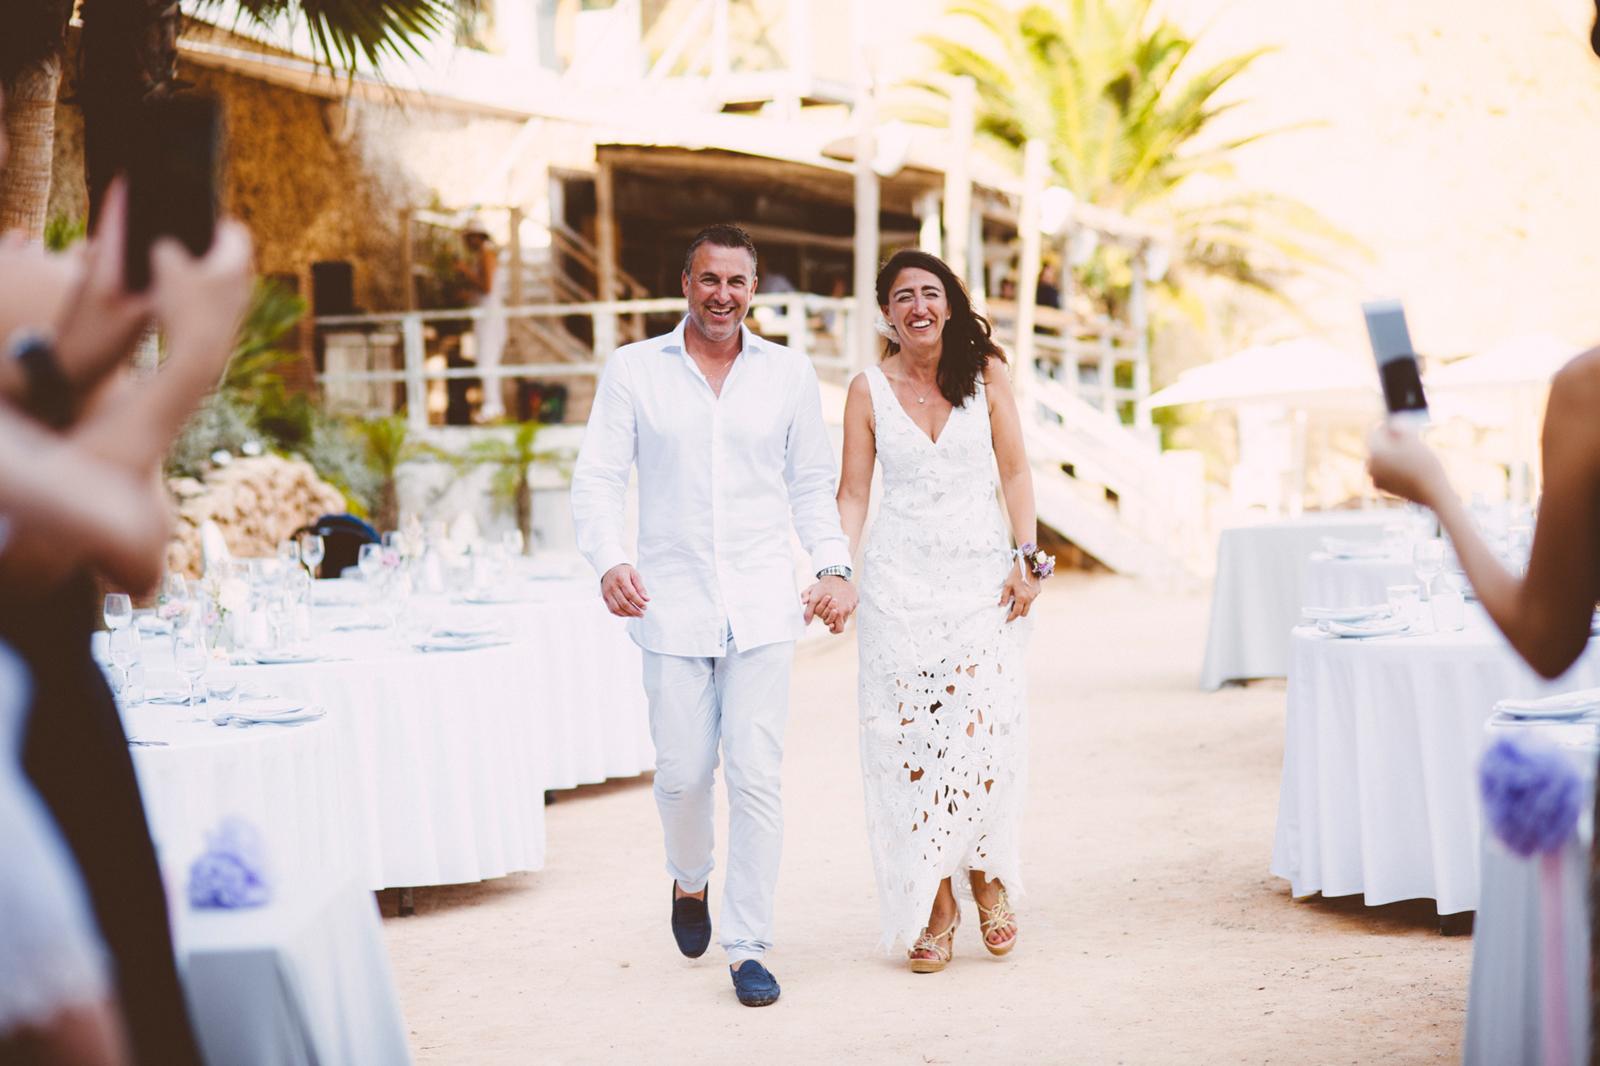 Hochzeitsfotograf_Ibiza_125.jpg